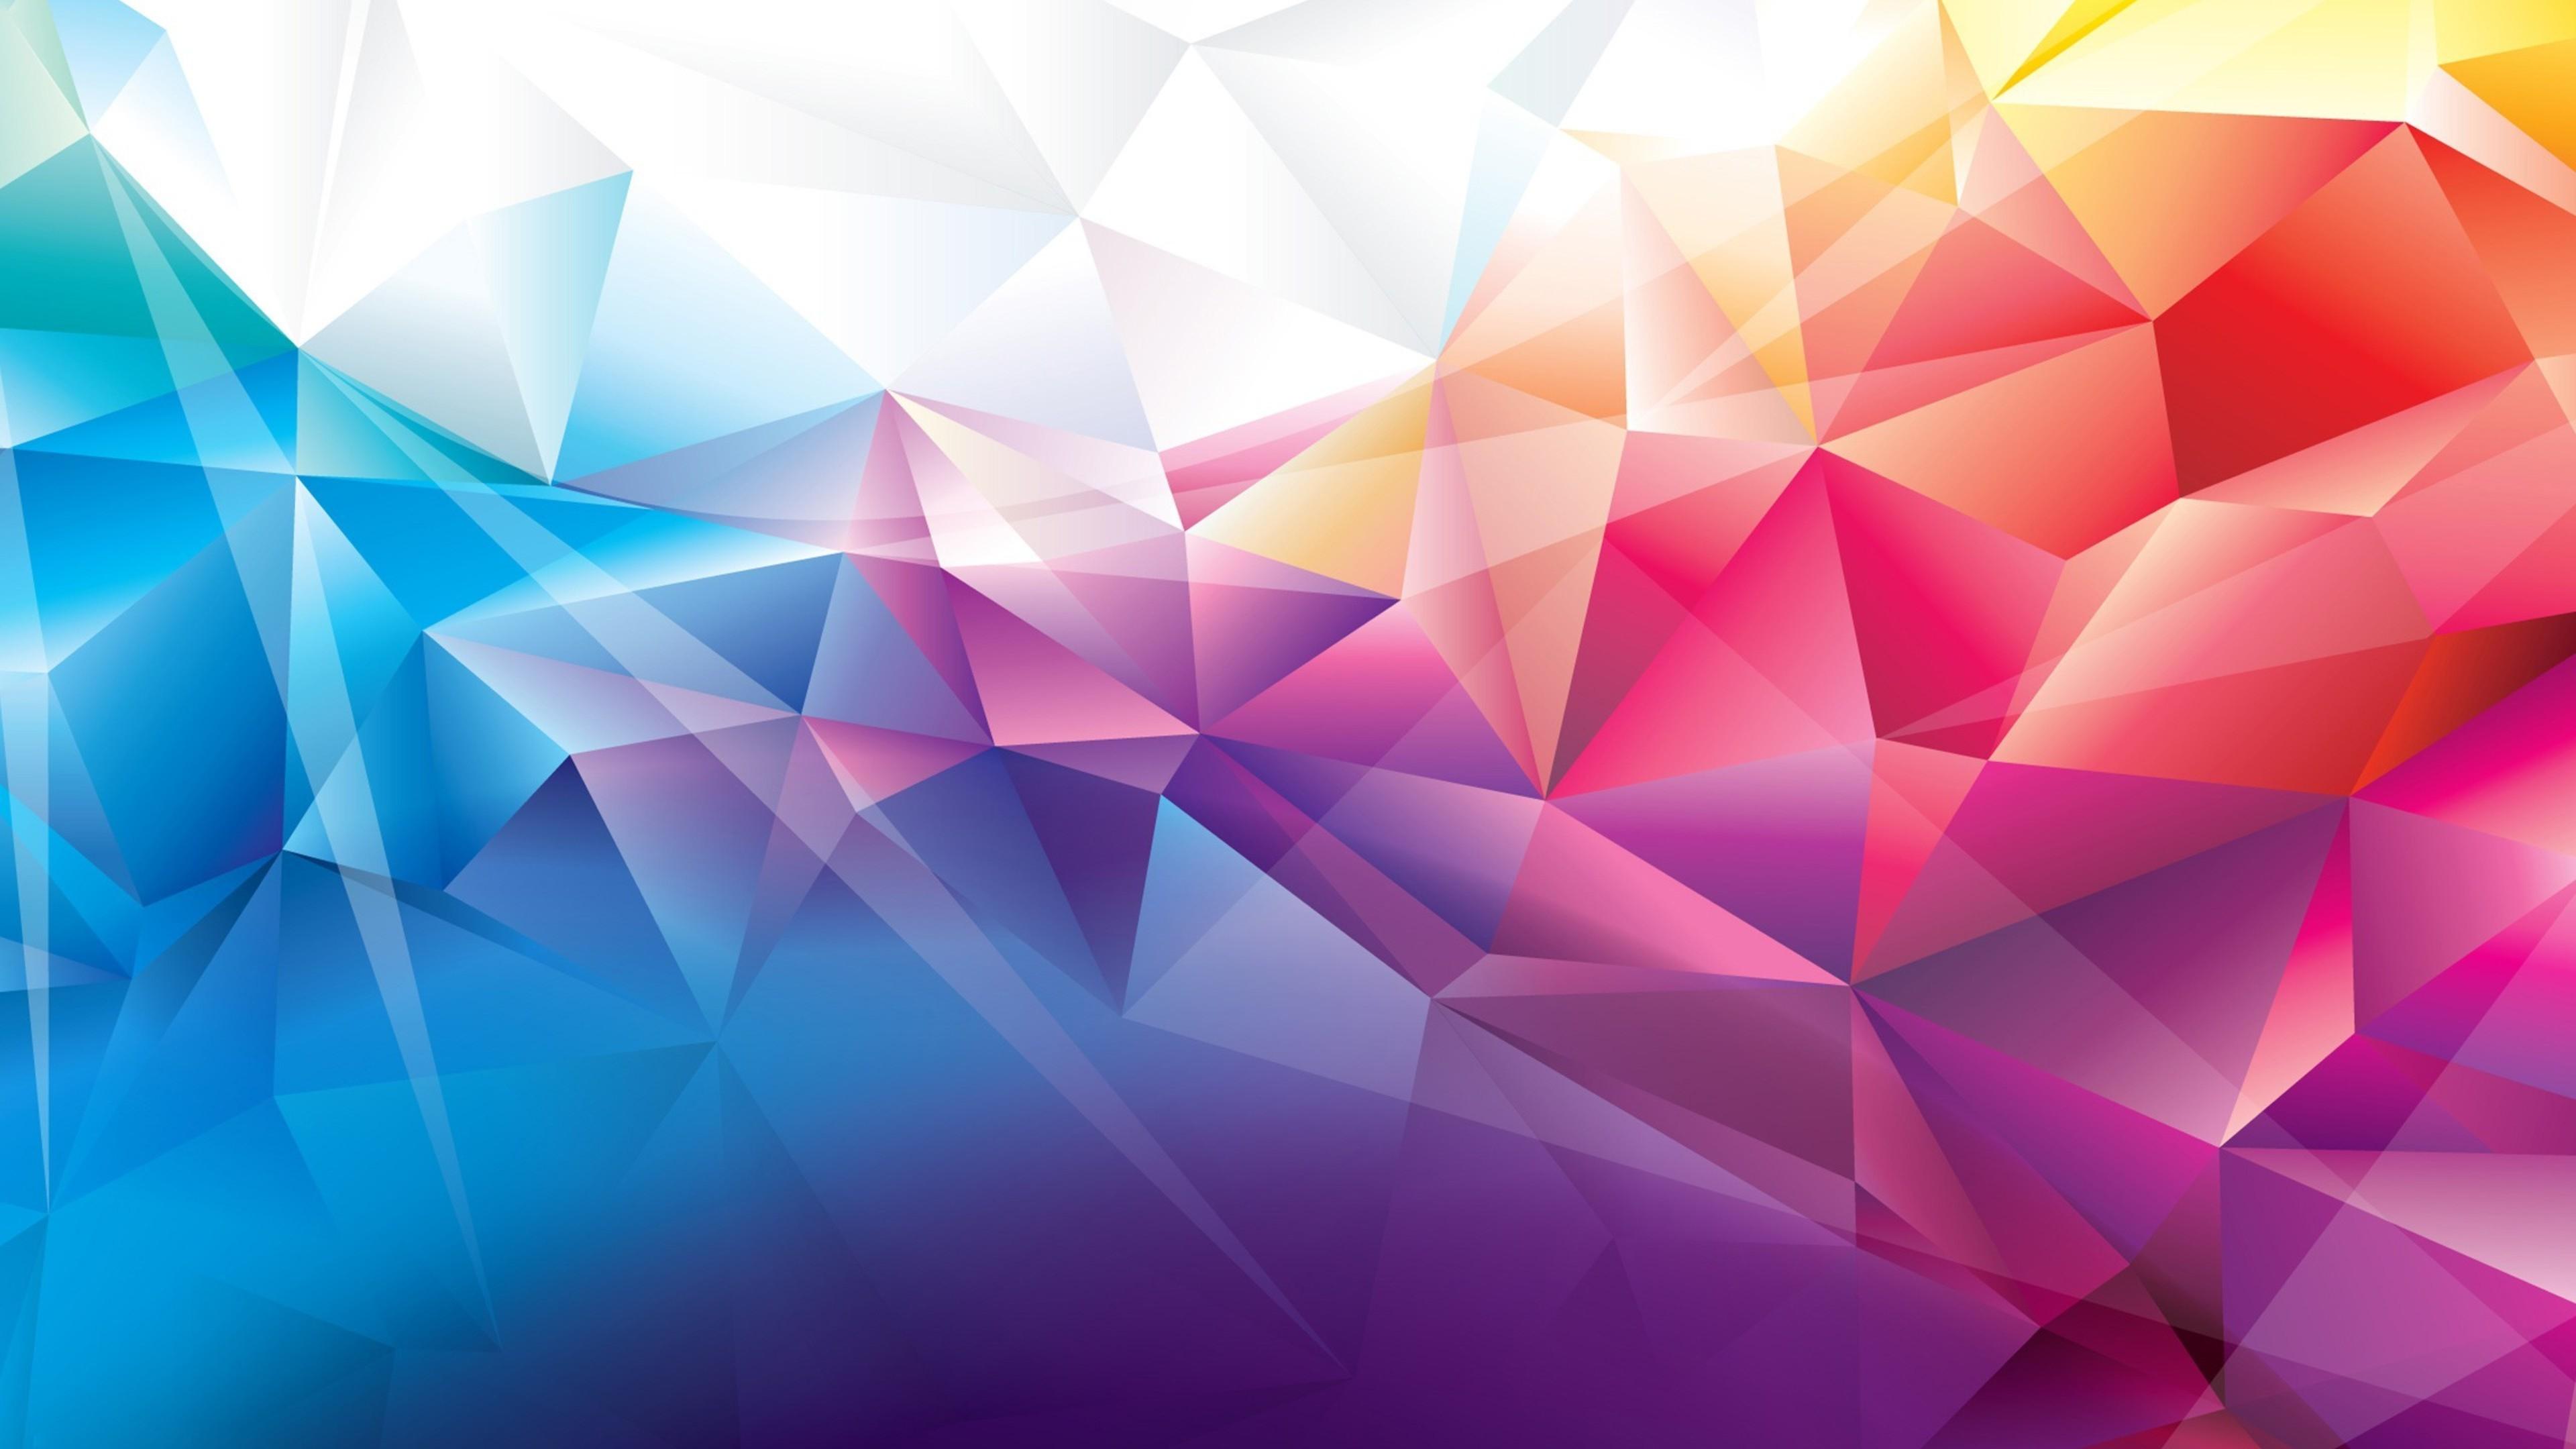 colorful polygons 1539370630 - Colorful Polygons - polygon wallpapers, colorful wallpapers, abstract wallpapers